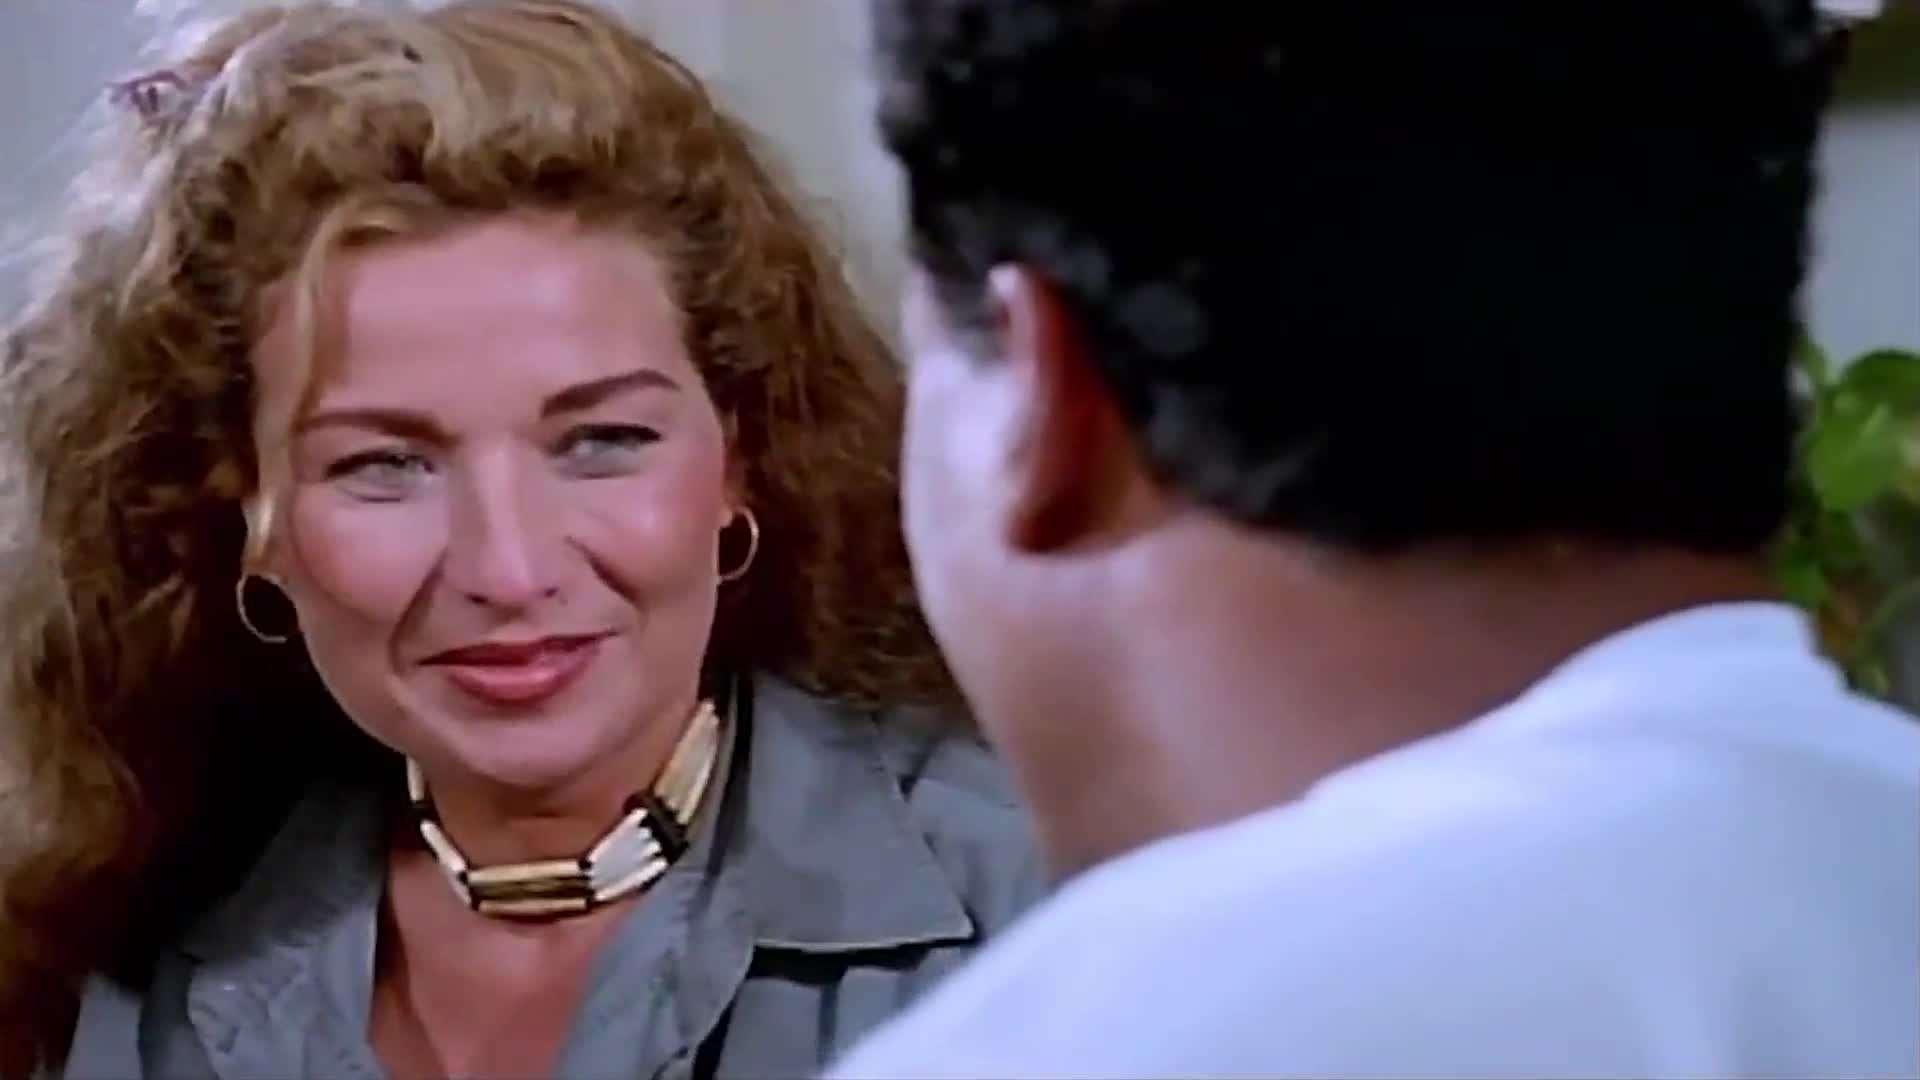 [فيلم][تورنت][تحميل][استاكوزا][1996][1080p][Web-DL] 15 arabp2p.com